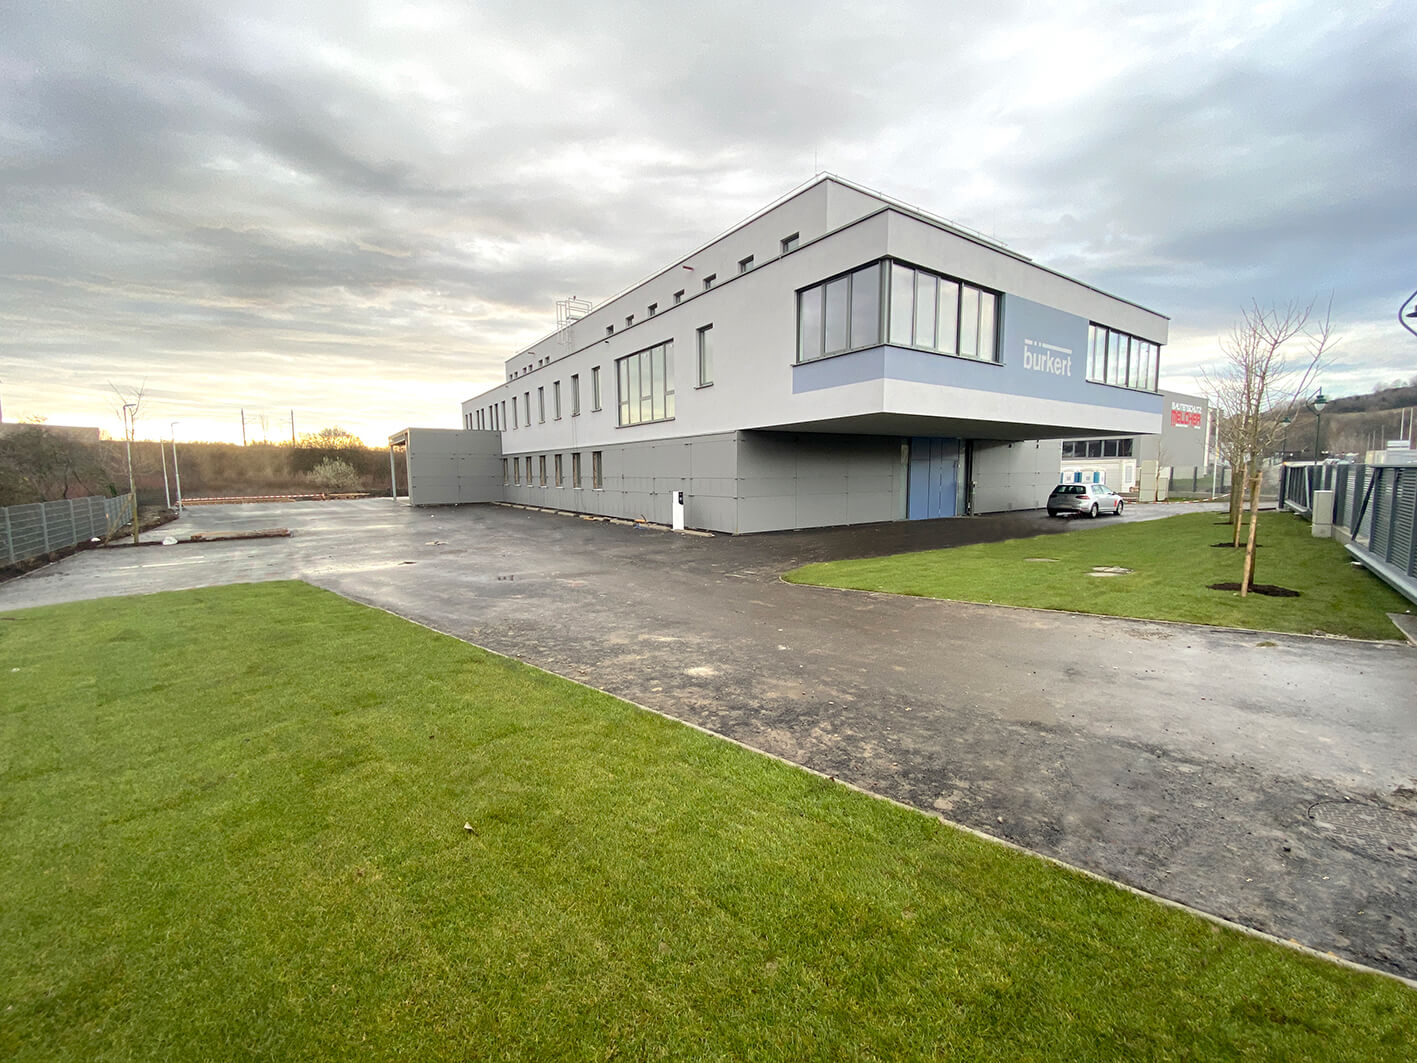 Vonkajší pohľad na Bürkert v Mödlingu